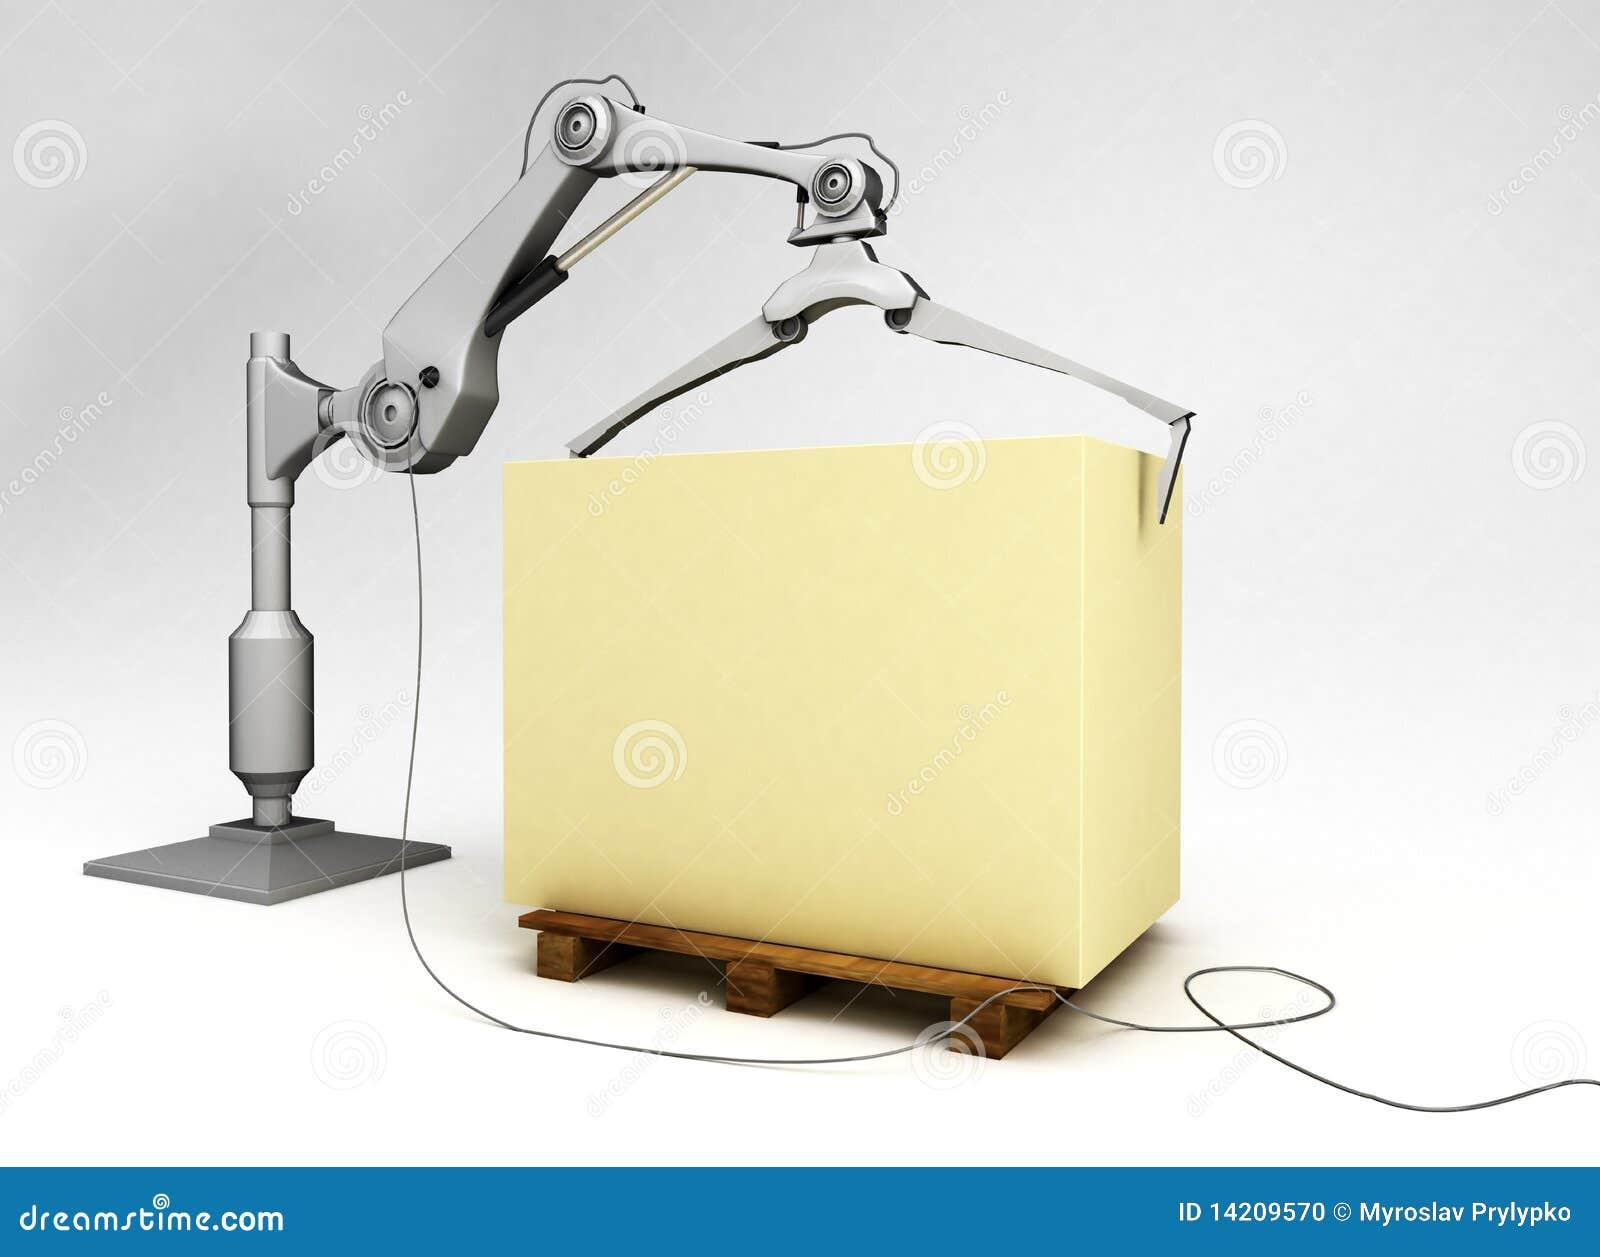 Manipulante mecánico universal